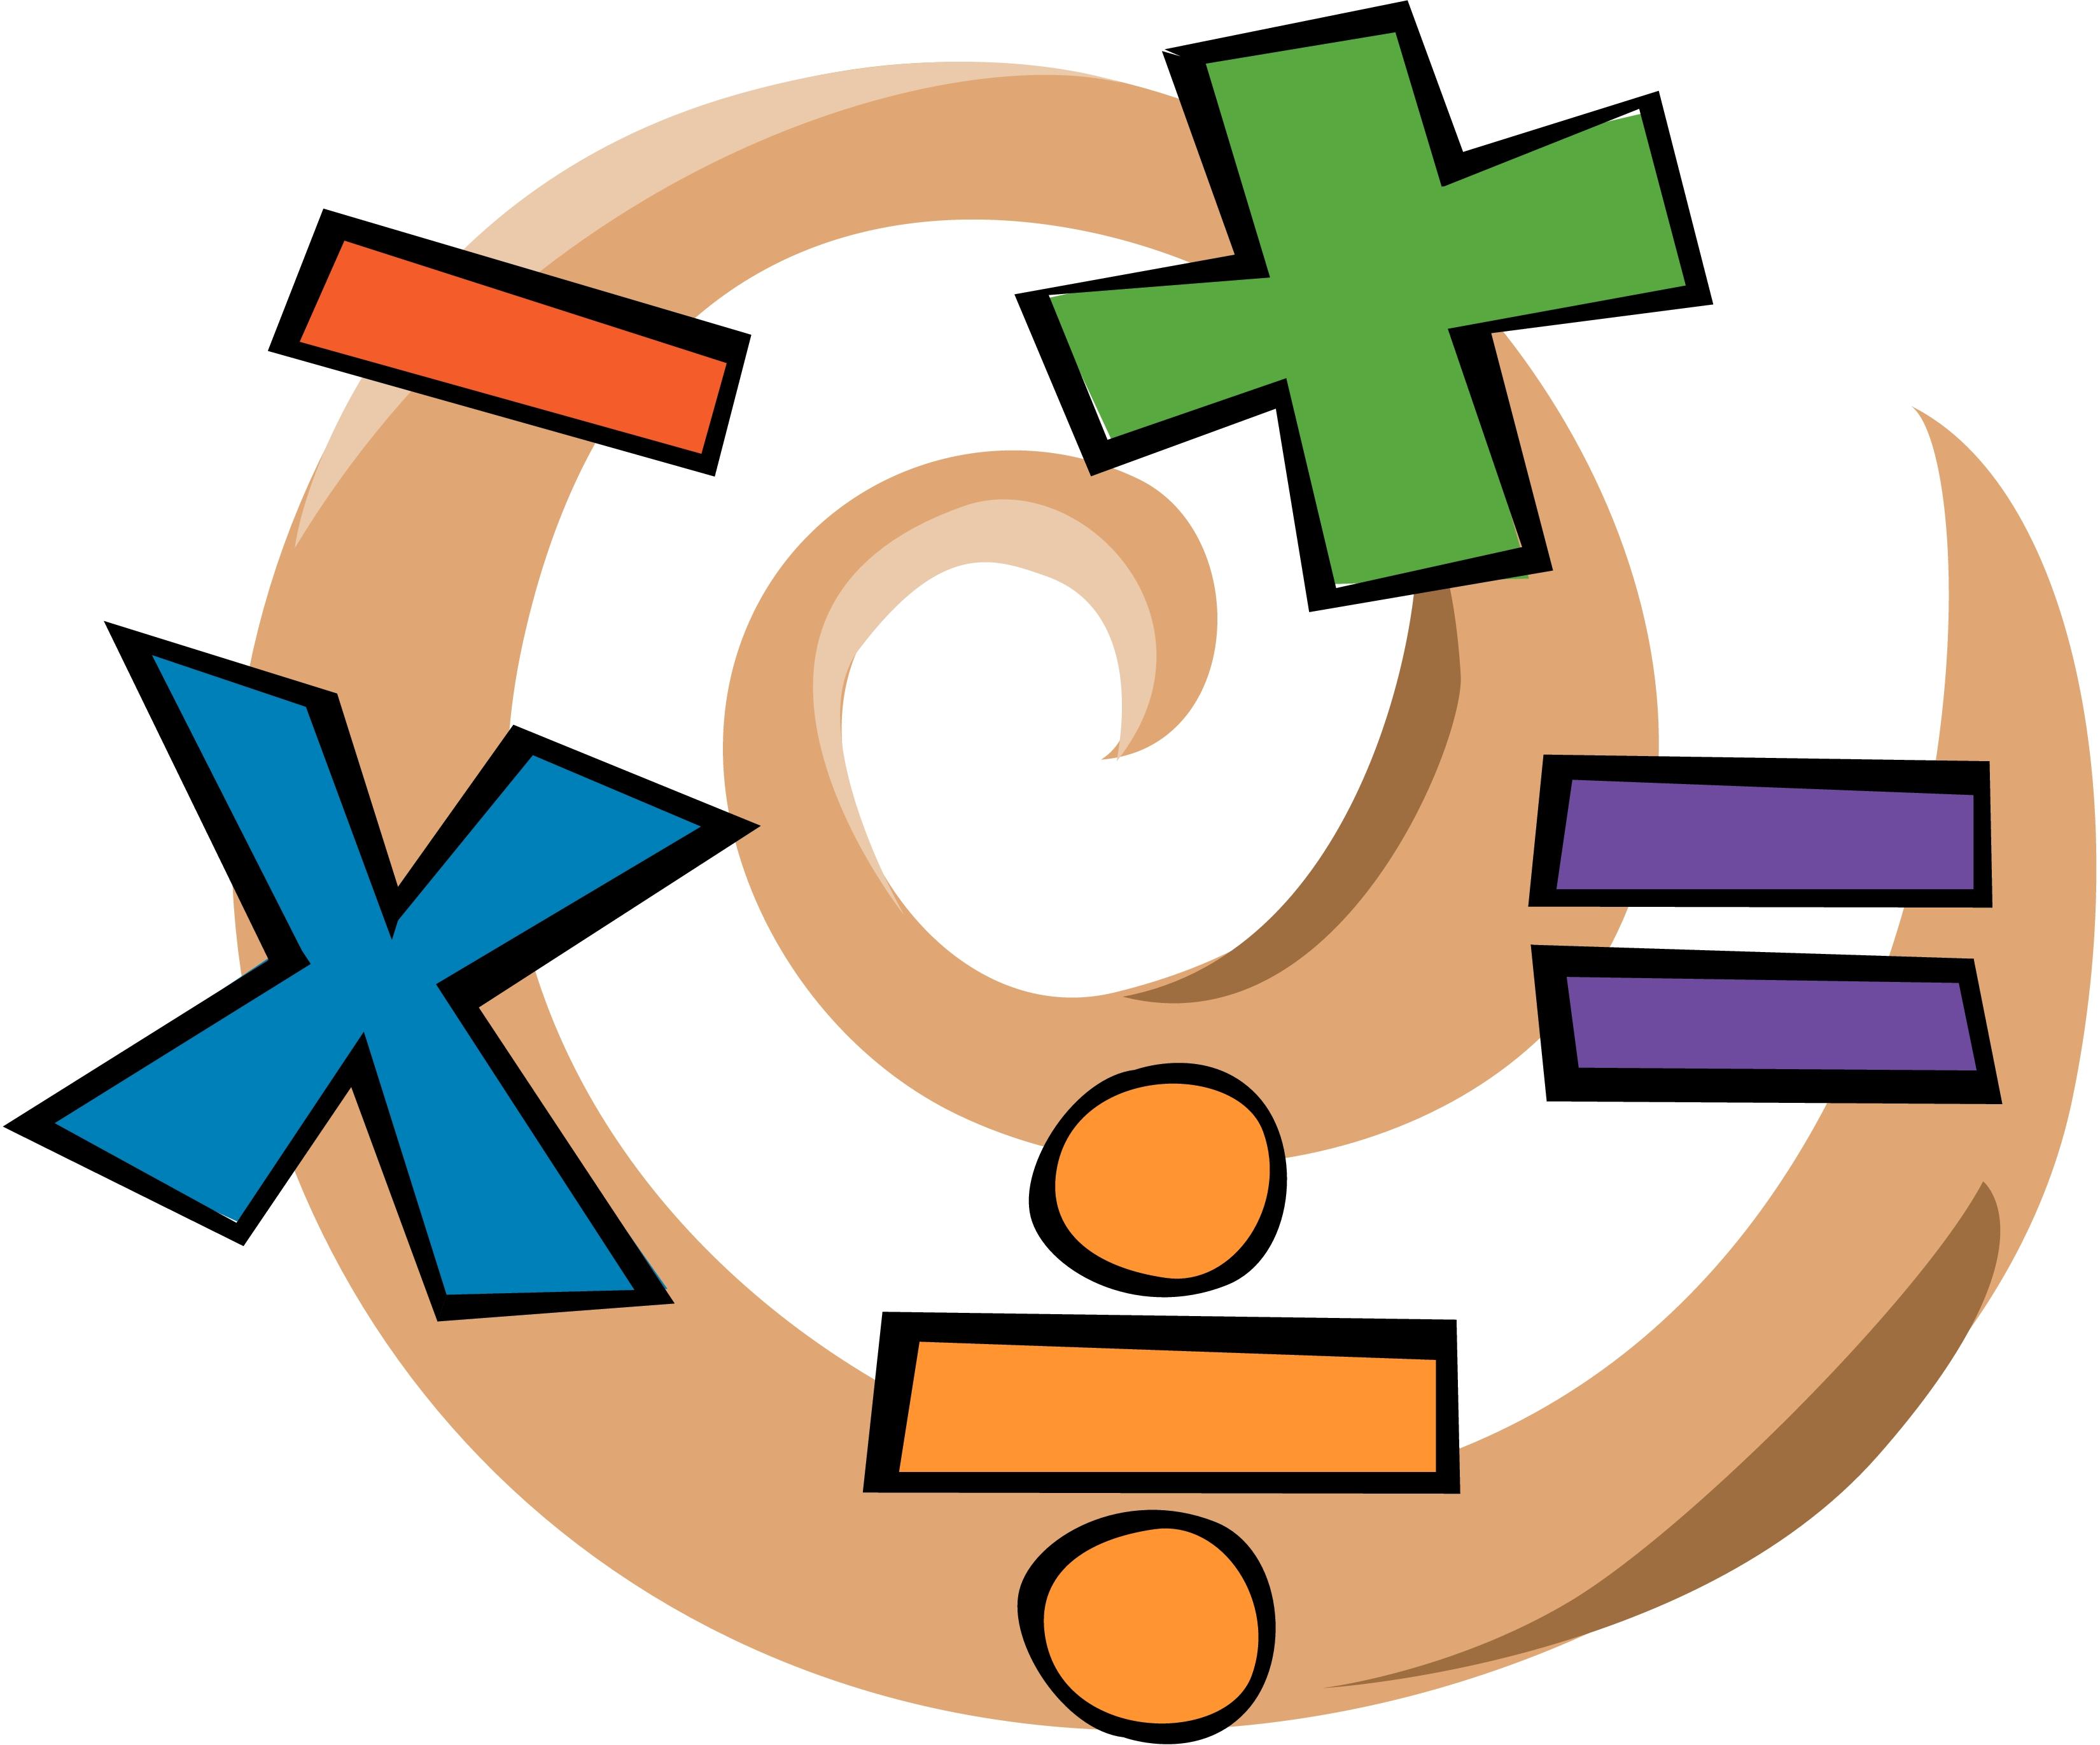 Free Math Picturs, Download Free Clip Art, Free Clip Art